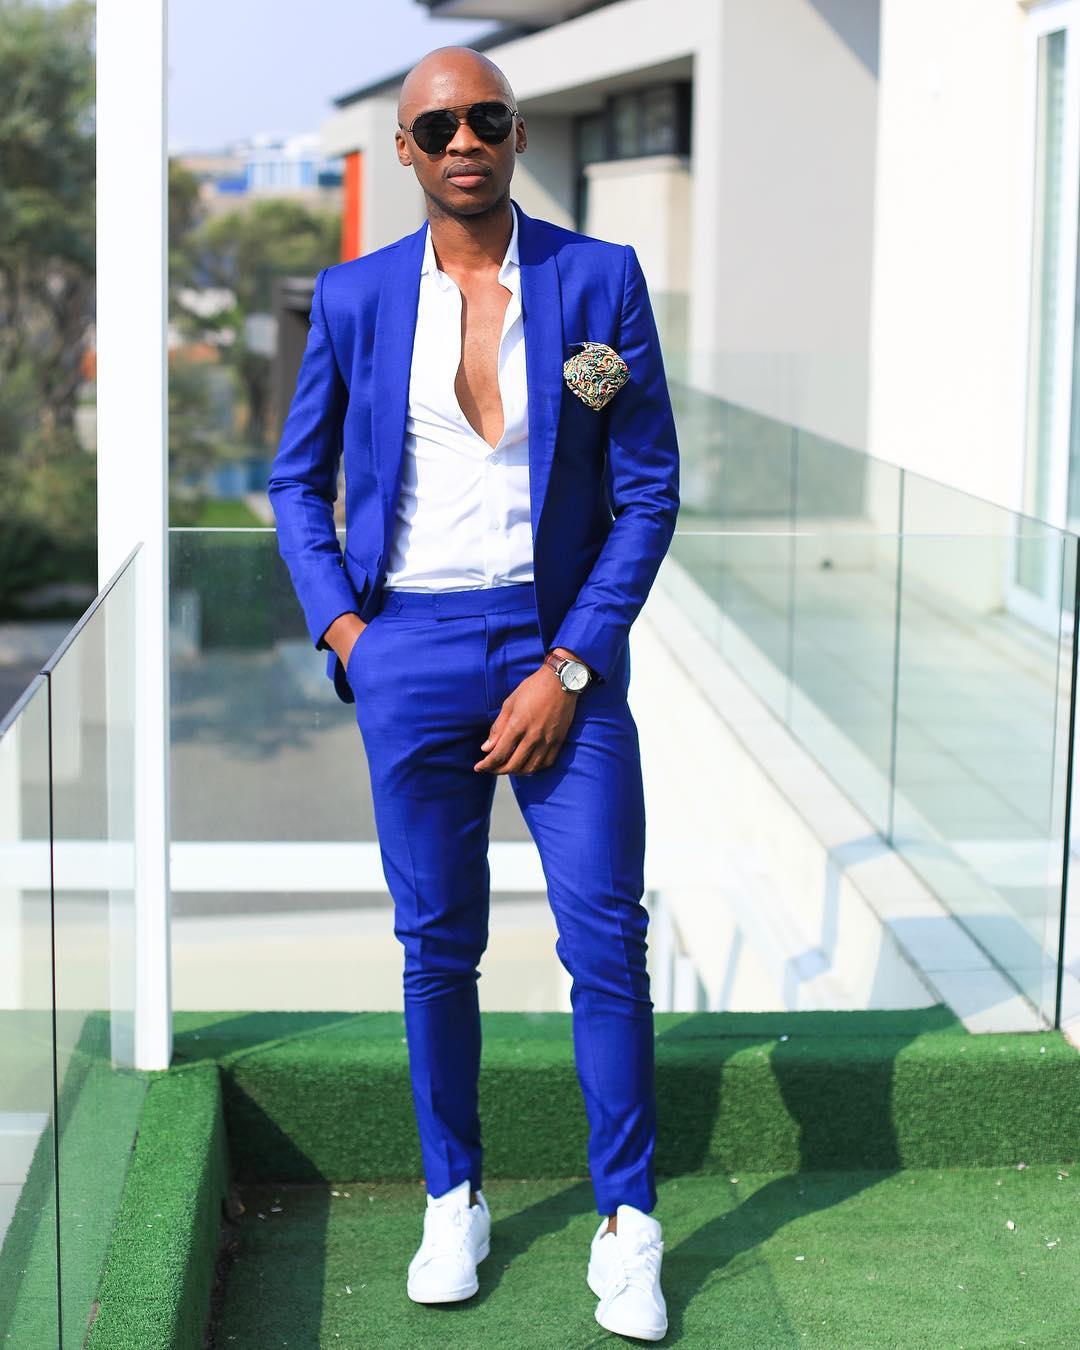 Nhlanhla Mchunu